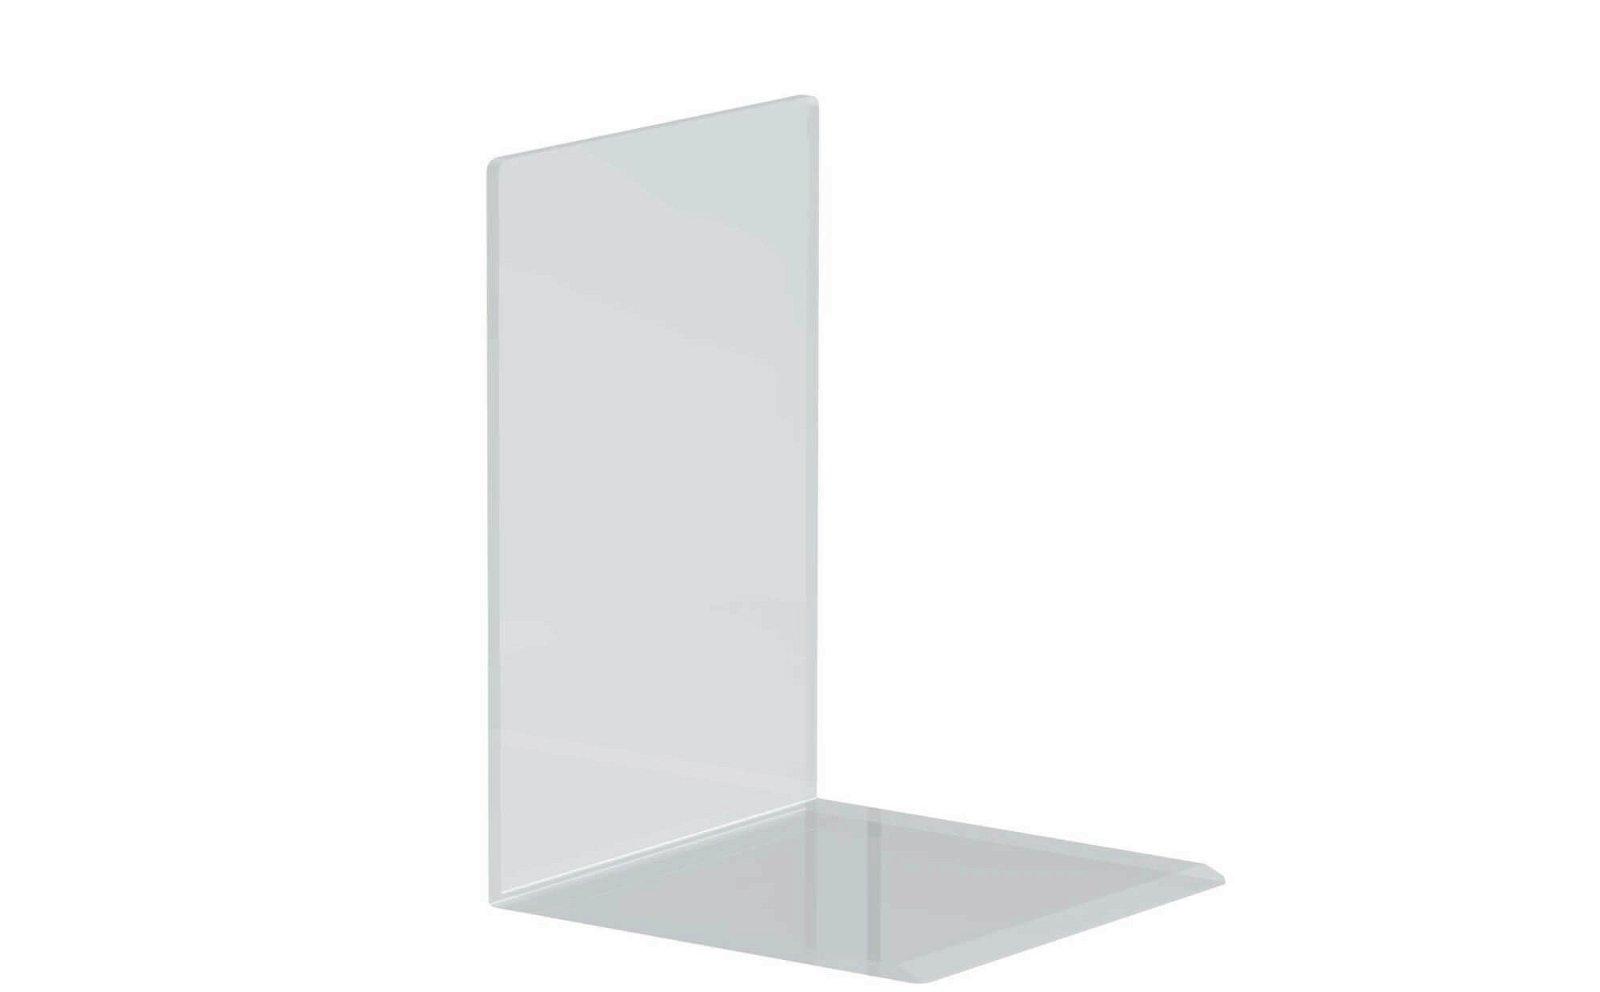 Buchstützen aus Acryl, 12 x 12 x 17 cm, glasklar